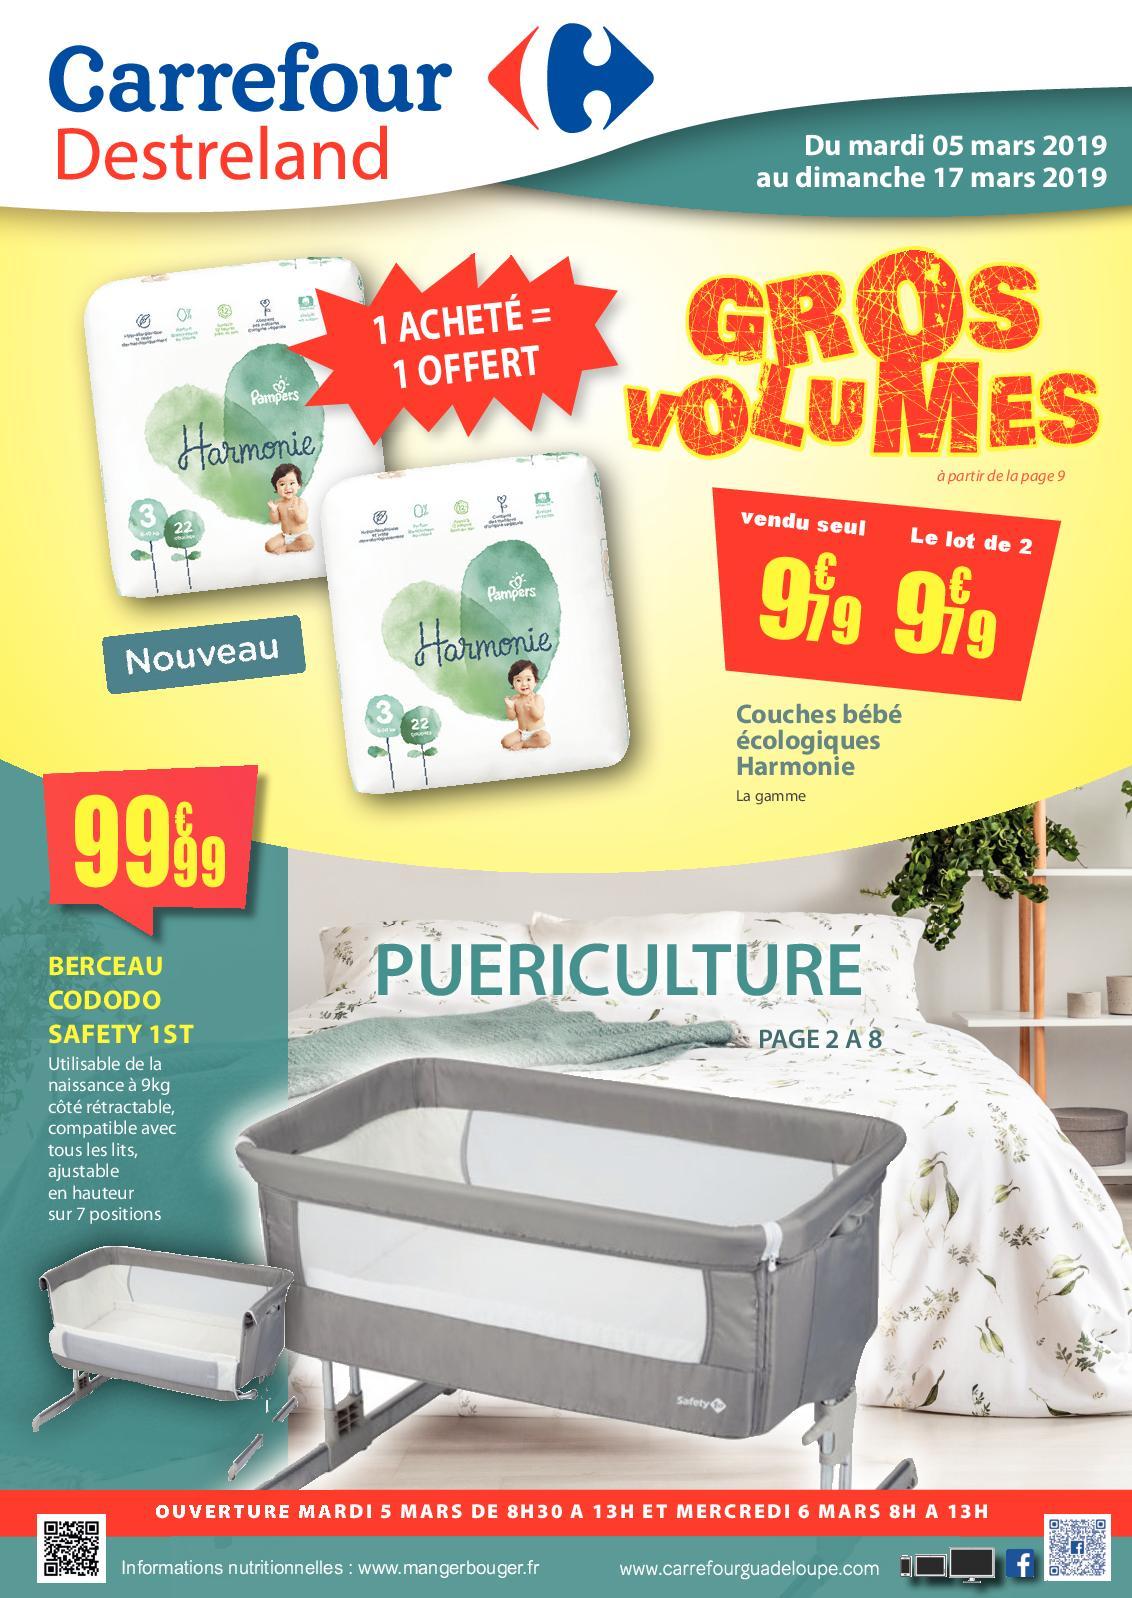 Calaméo Carrefour Destreland Gros Volumes Puericulture